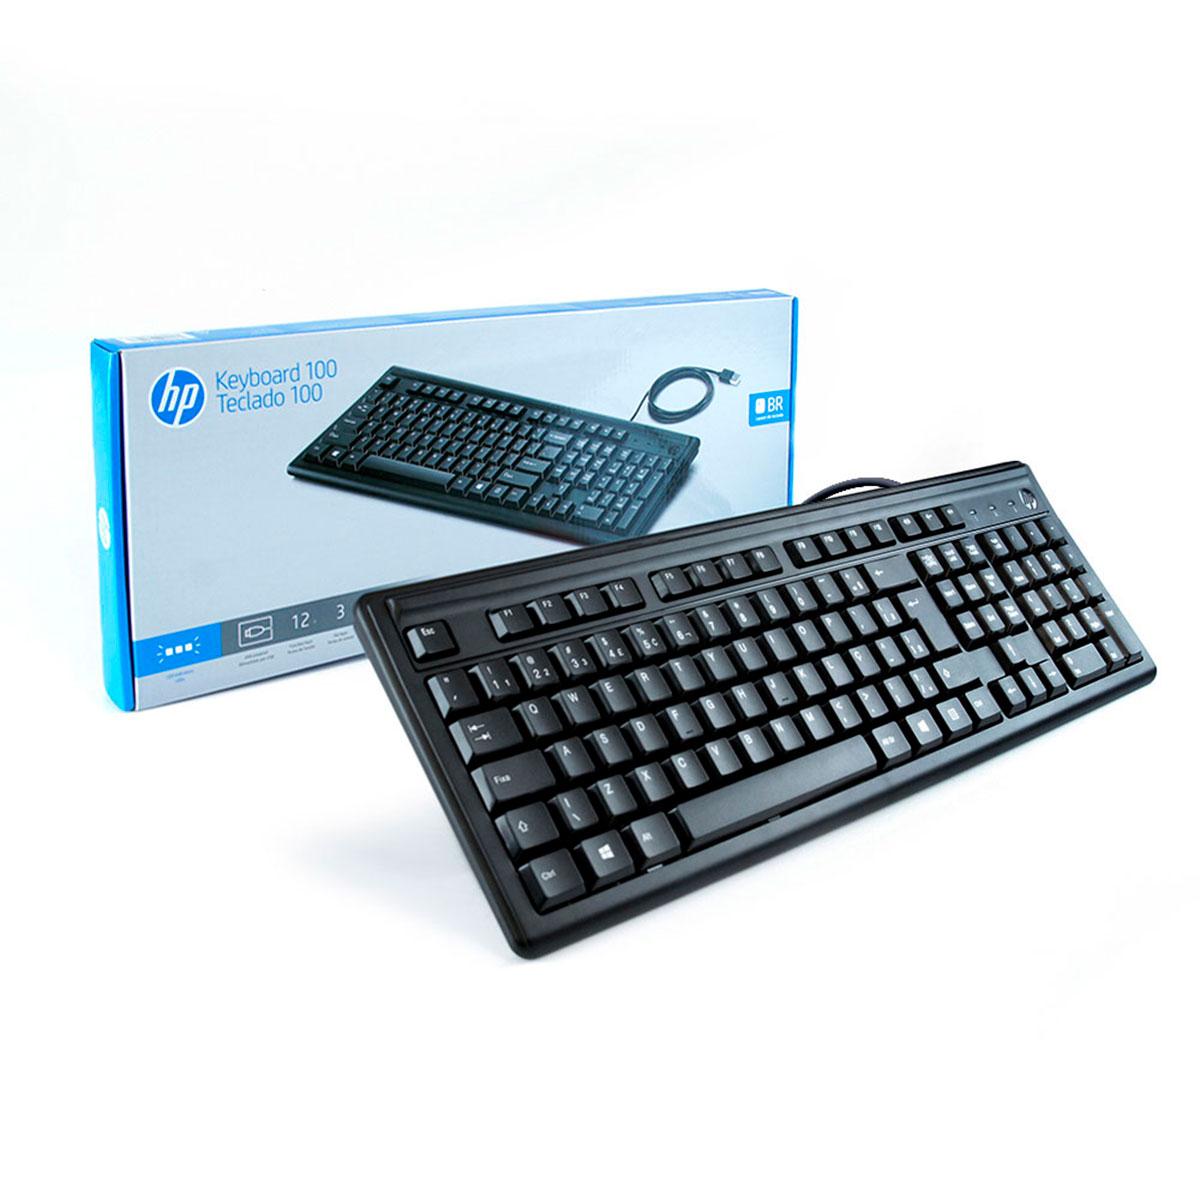 Teclado HP 100, USB, ABNT2, Preto - 2UN30AA